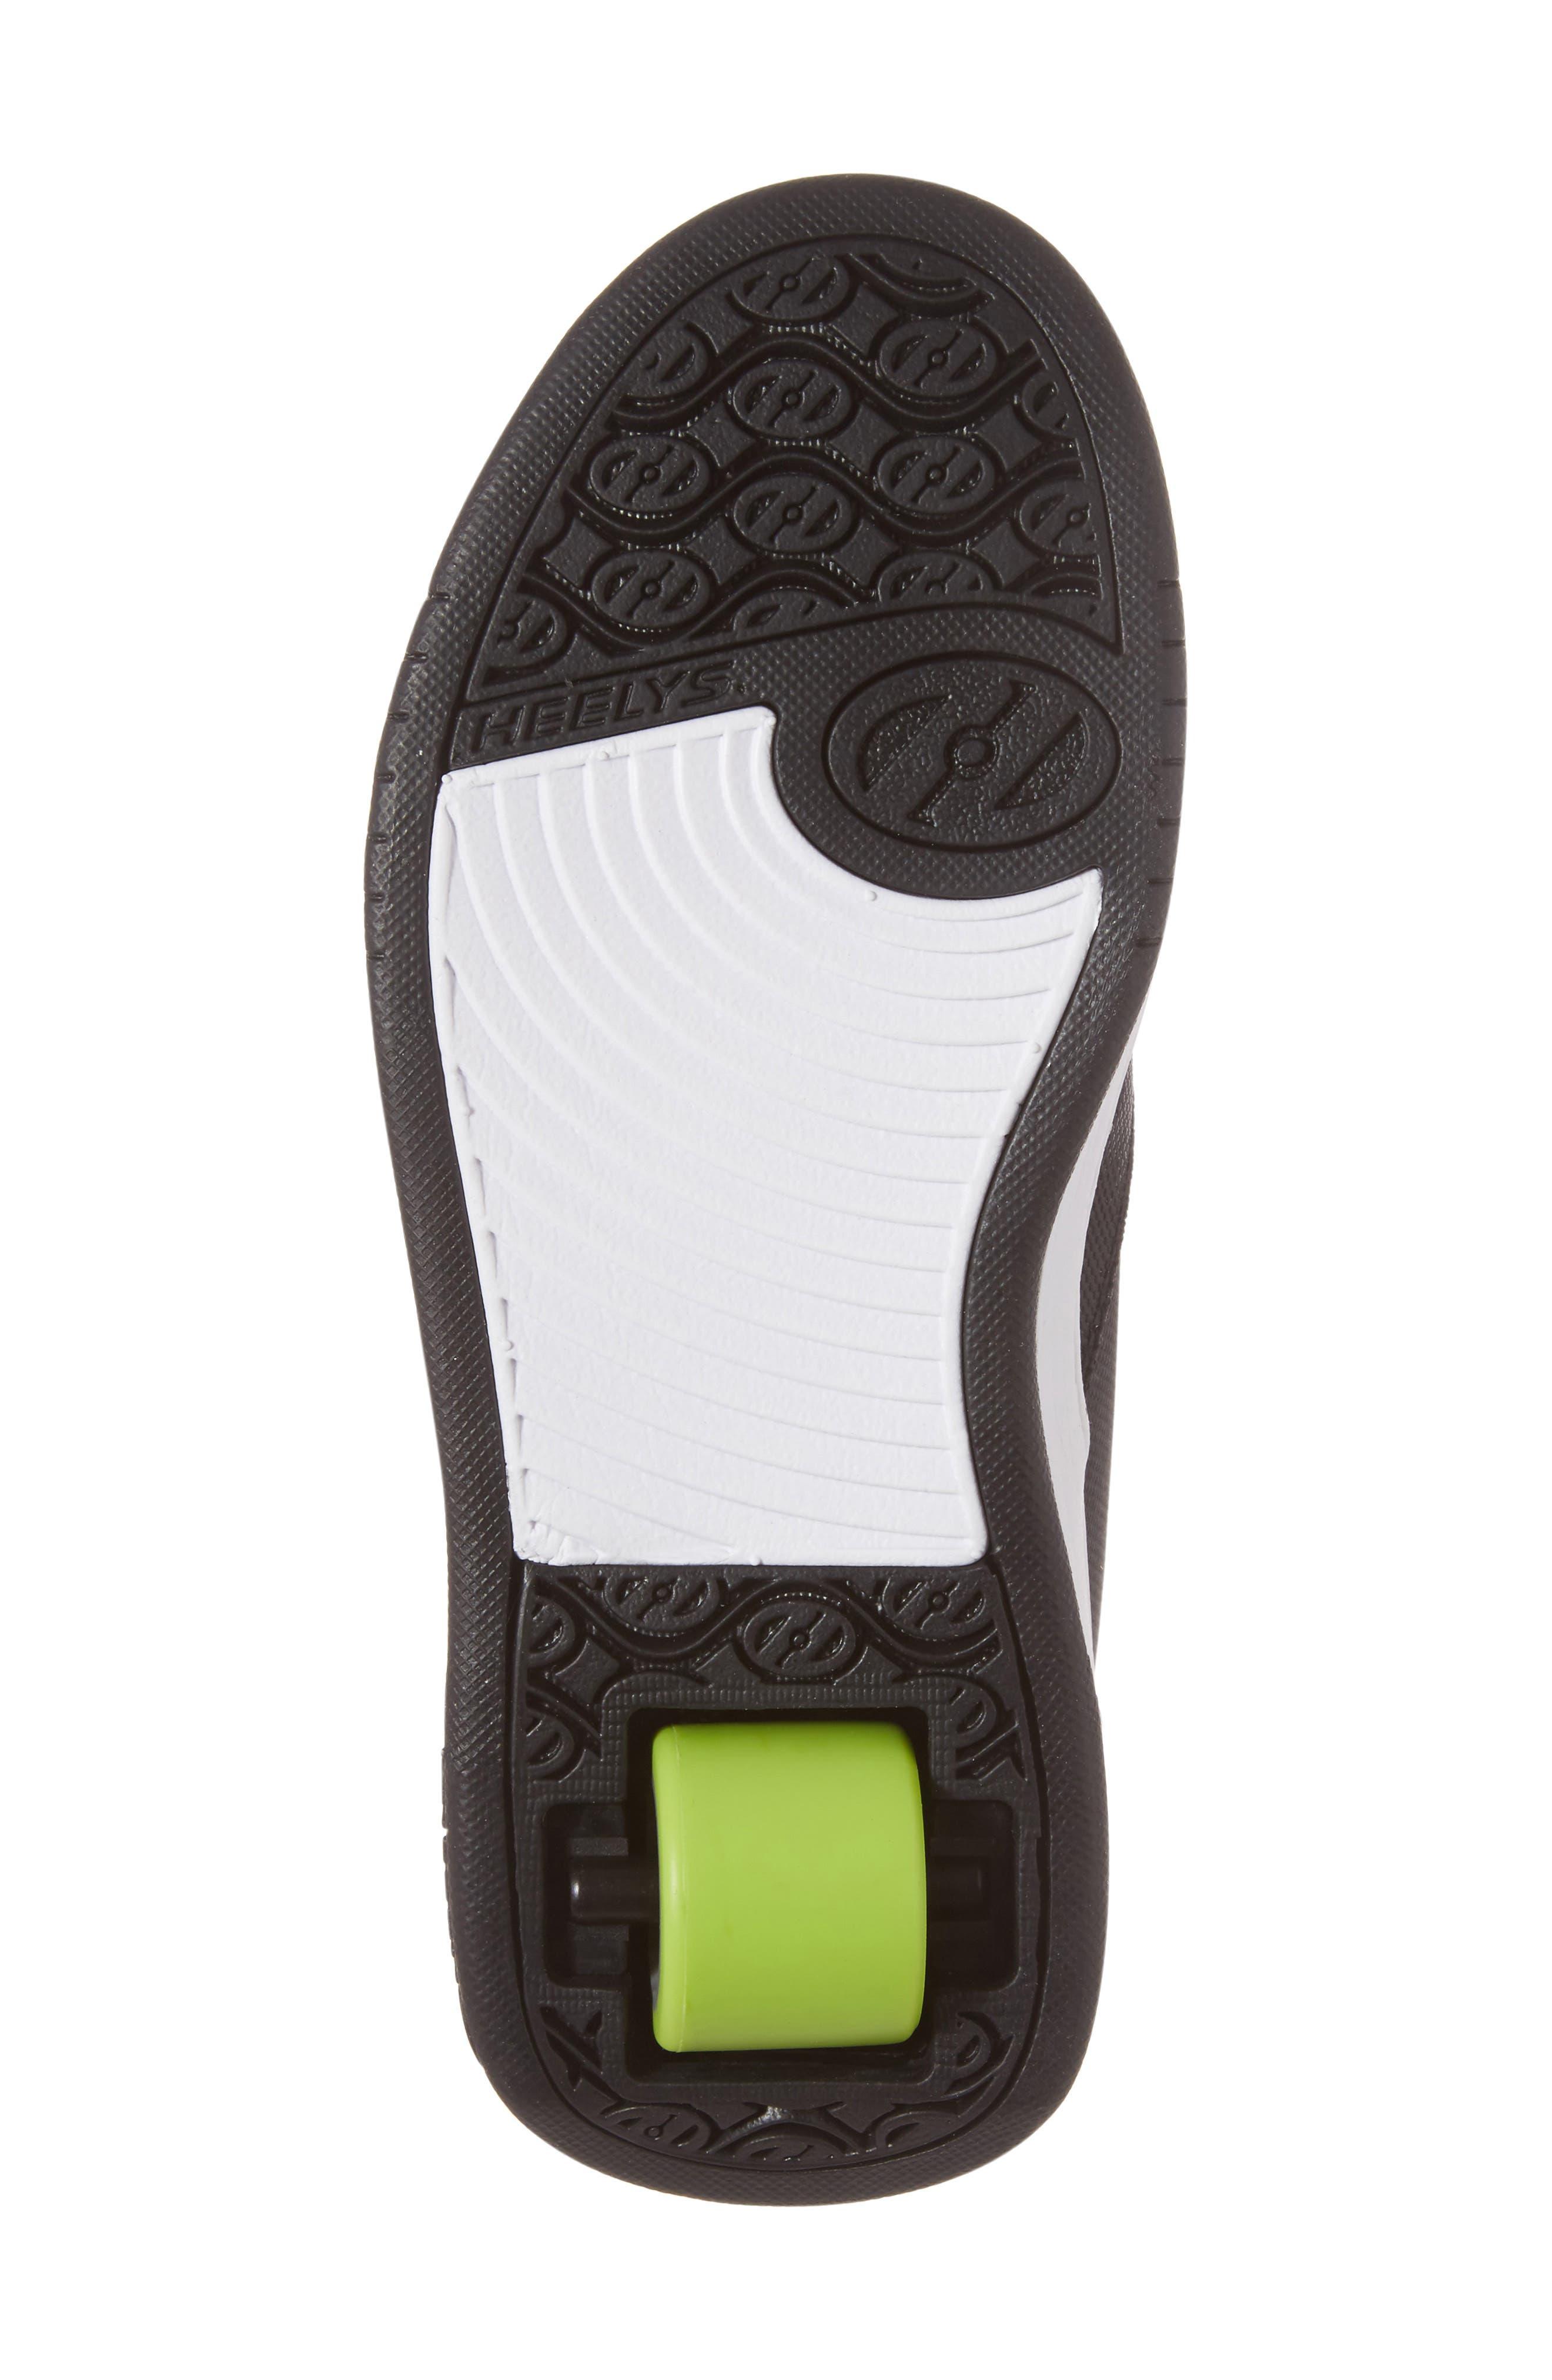 HEELYS,                             'Propel 2.0' Wheeled Sneaker,                             Alternate thumbnail 6, color,                             018